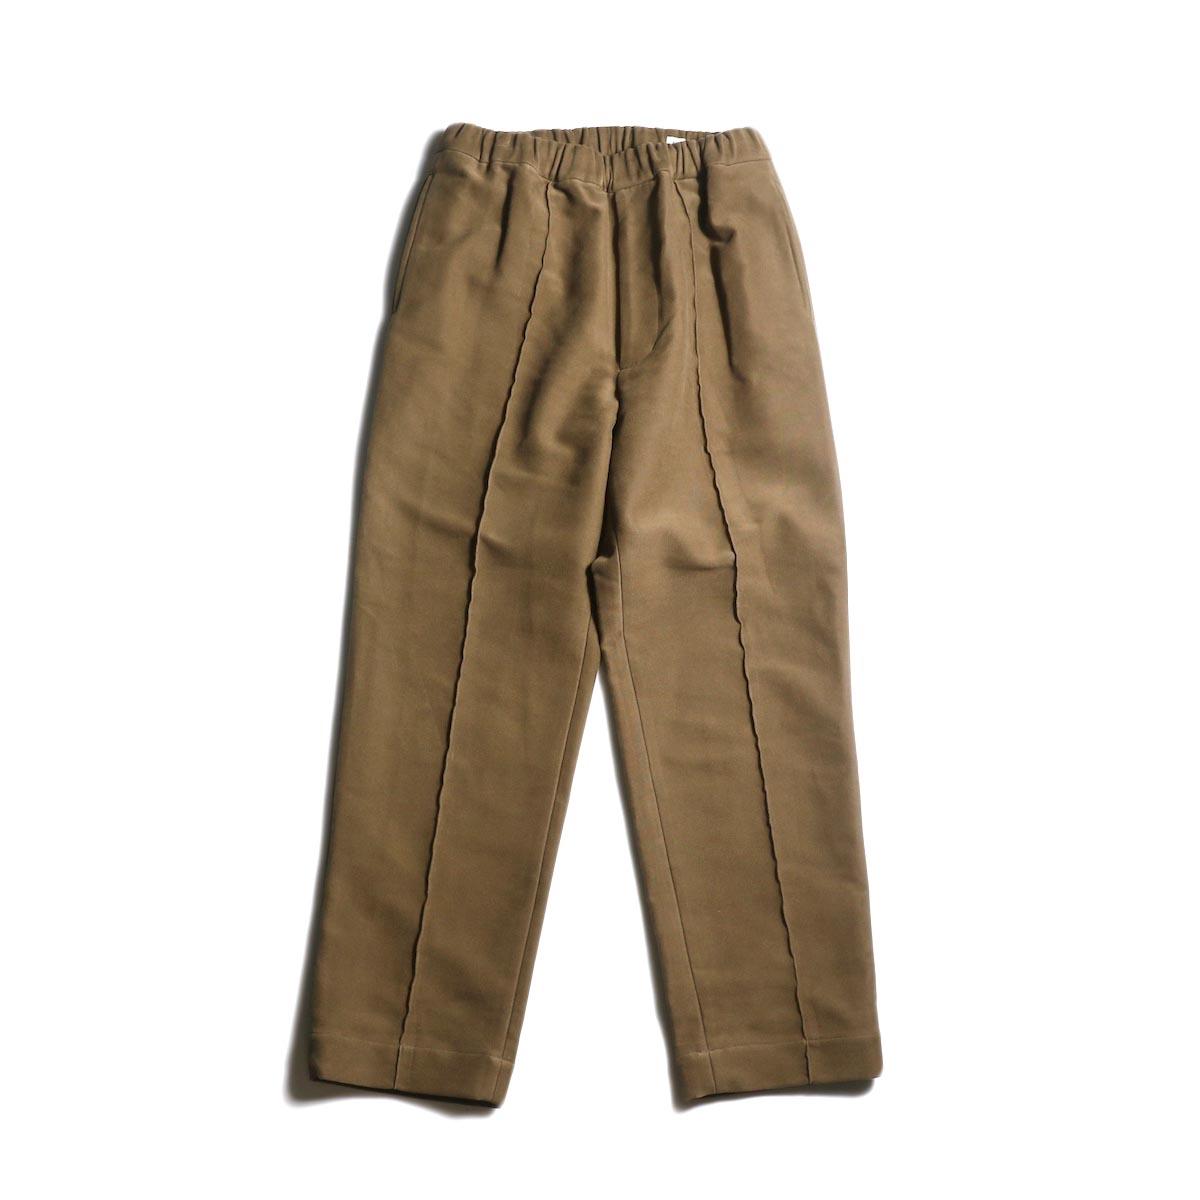 Kaptain Sunshine / Crease Tucked Easy Pants (Mocha Brown)